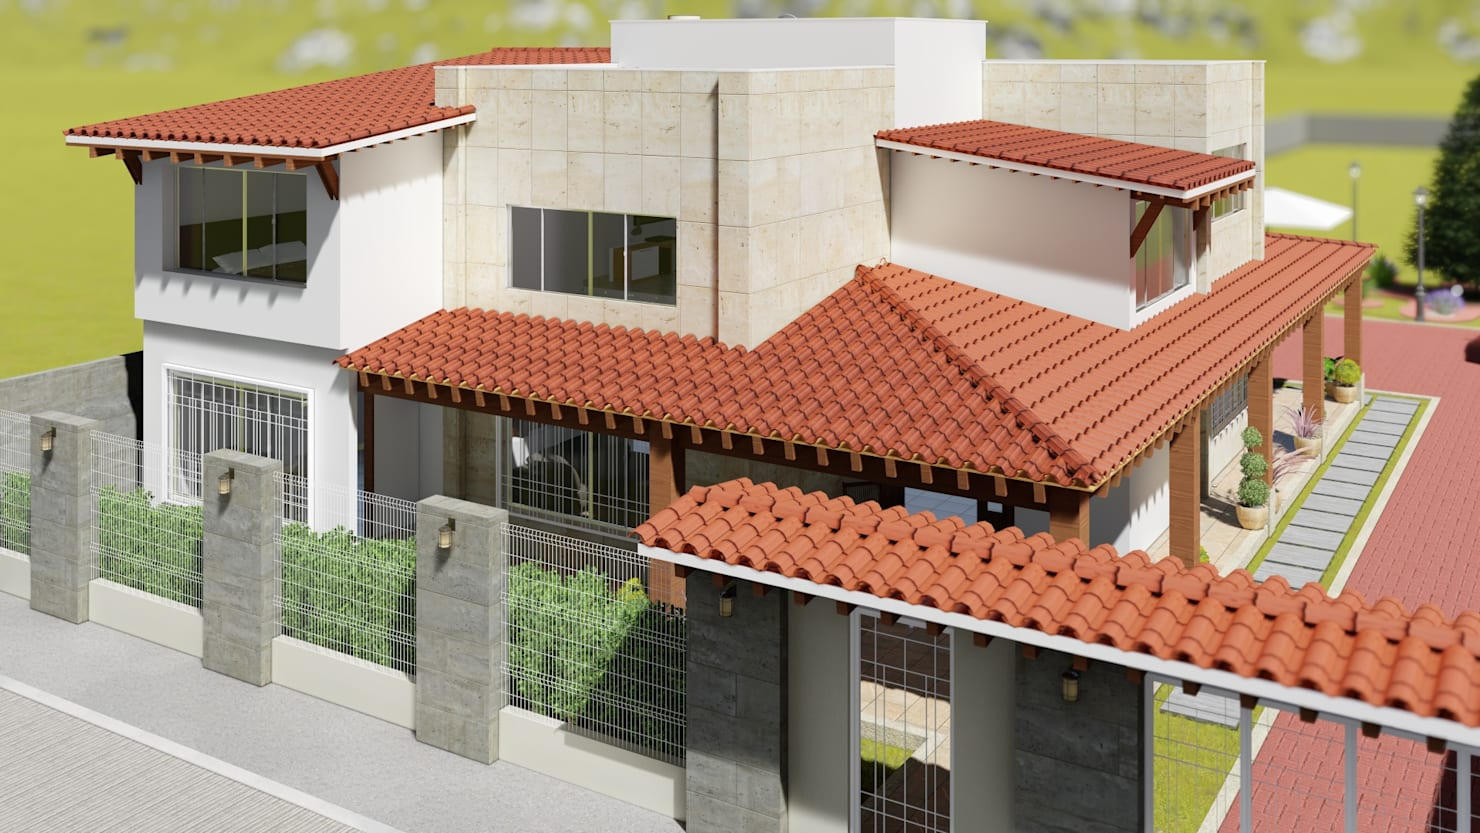 Una casa moderna con toque tradicional ¡te va a encantar!